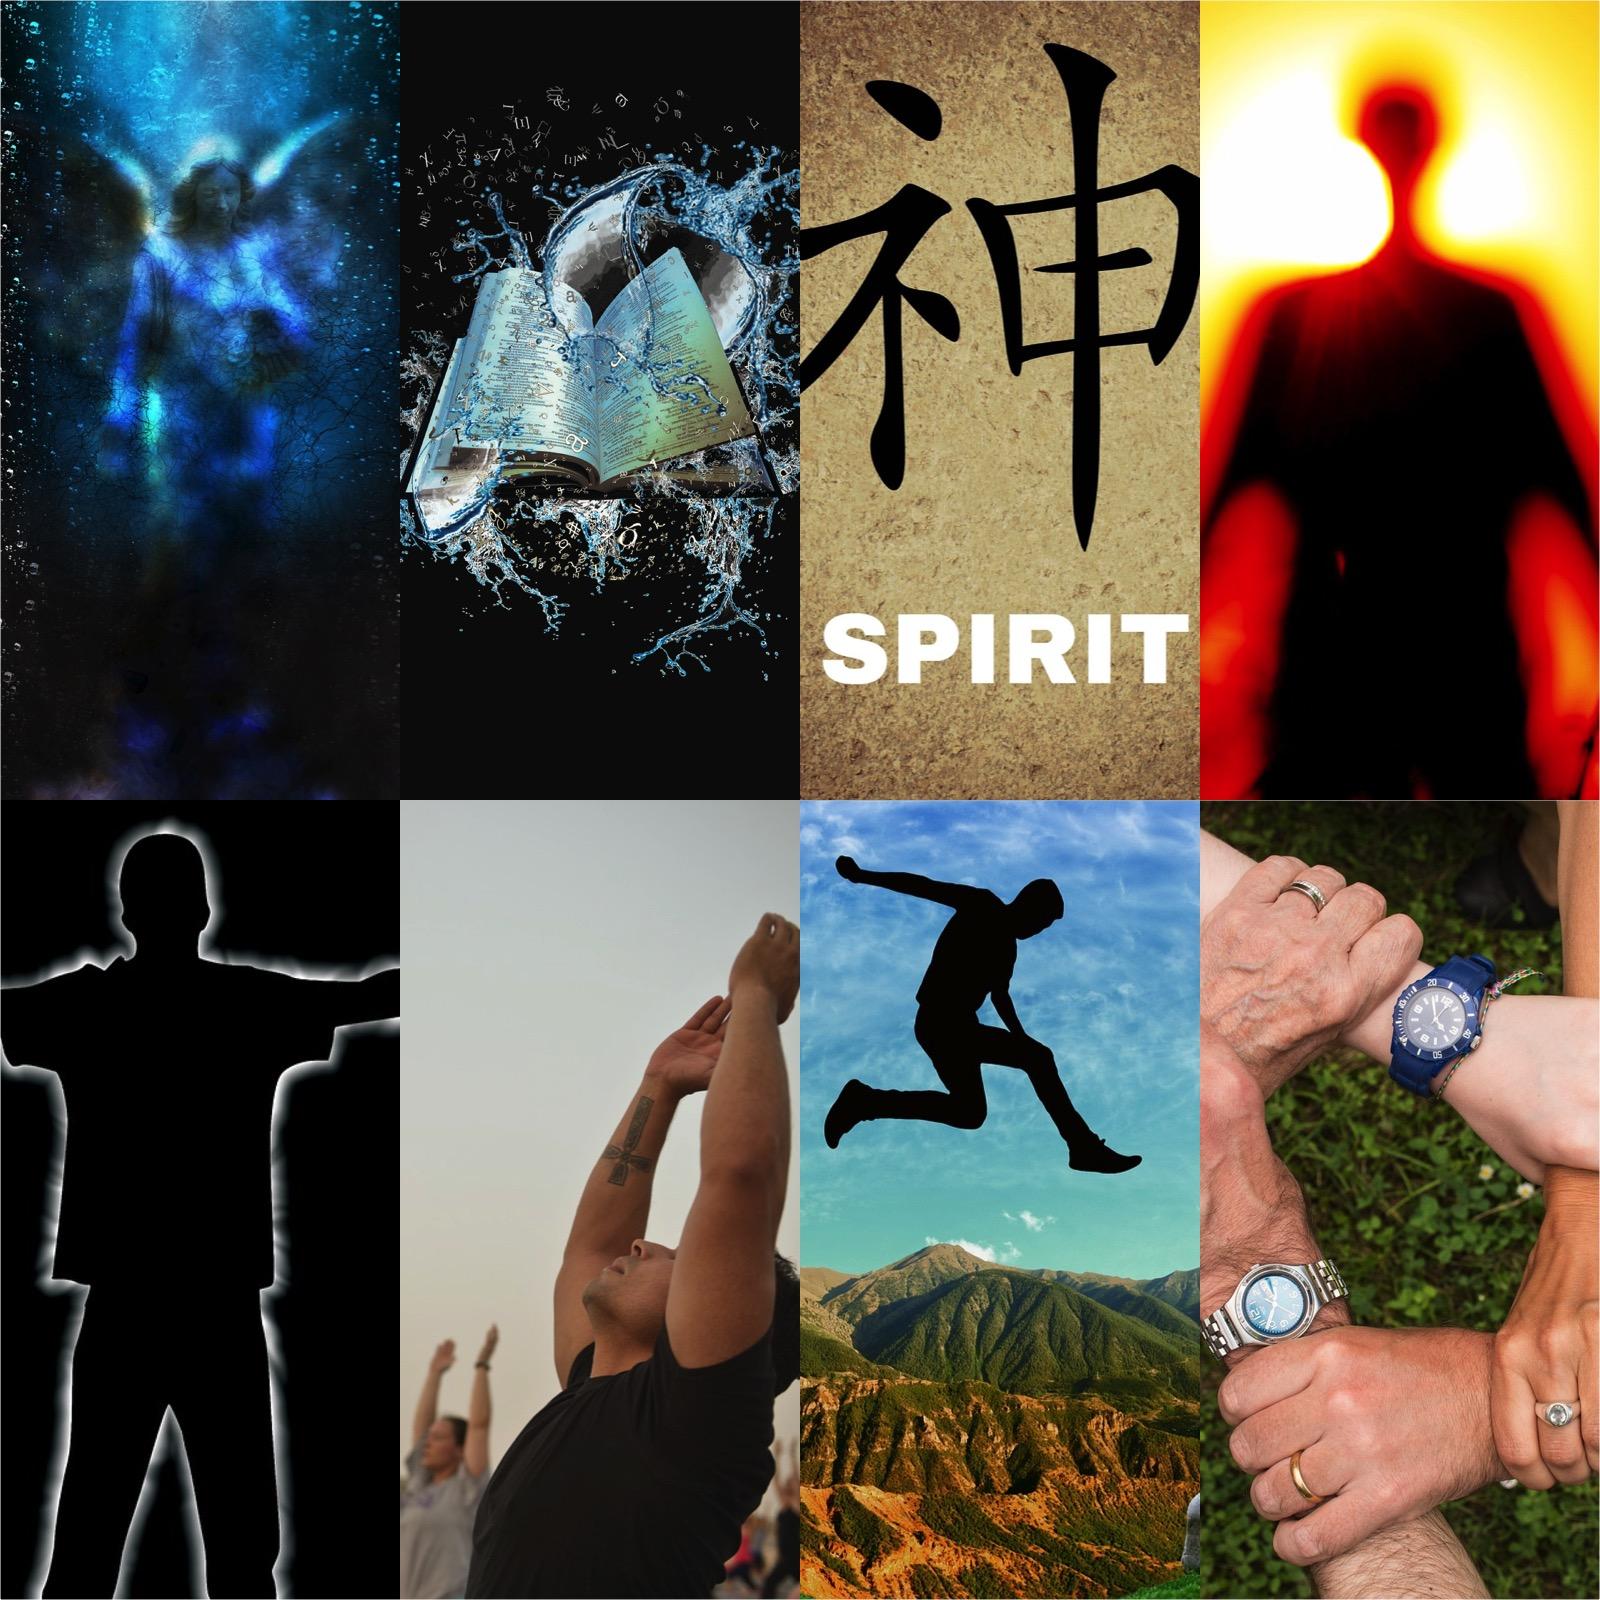 10 Songs That Exhibit Spirit | Playlist